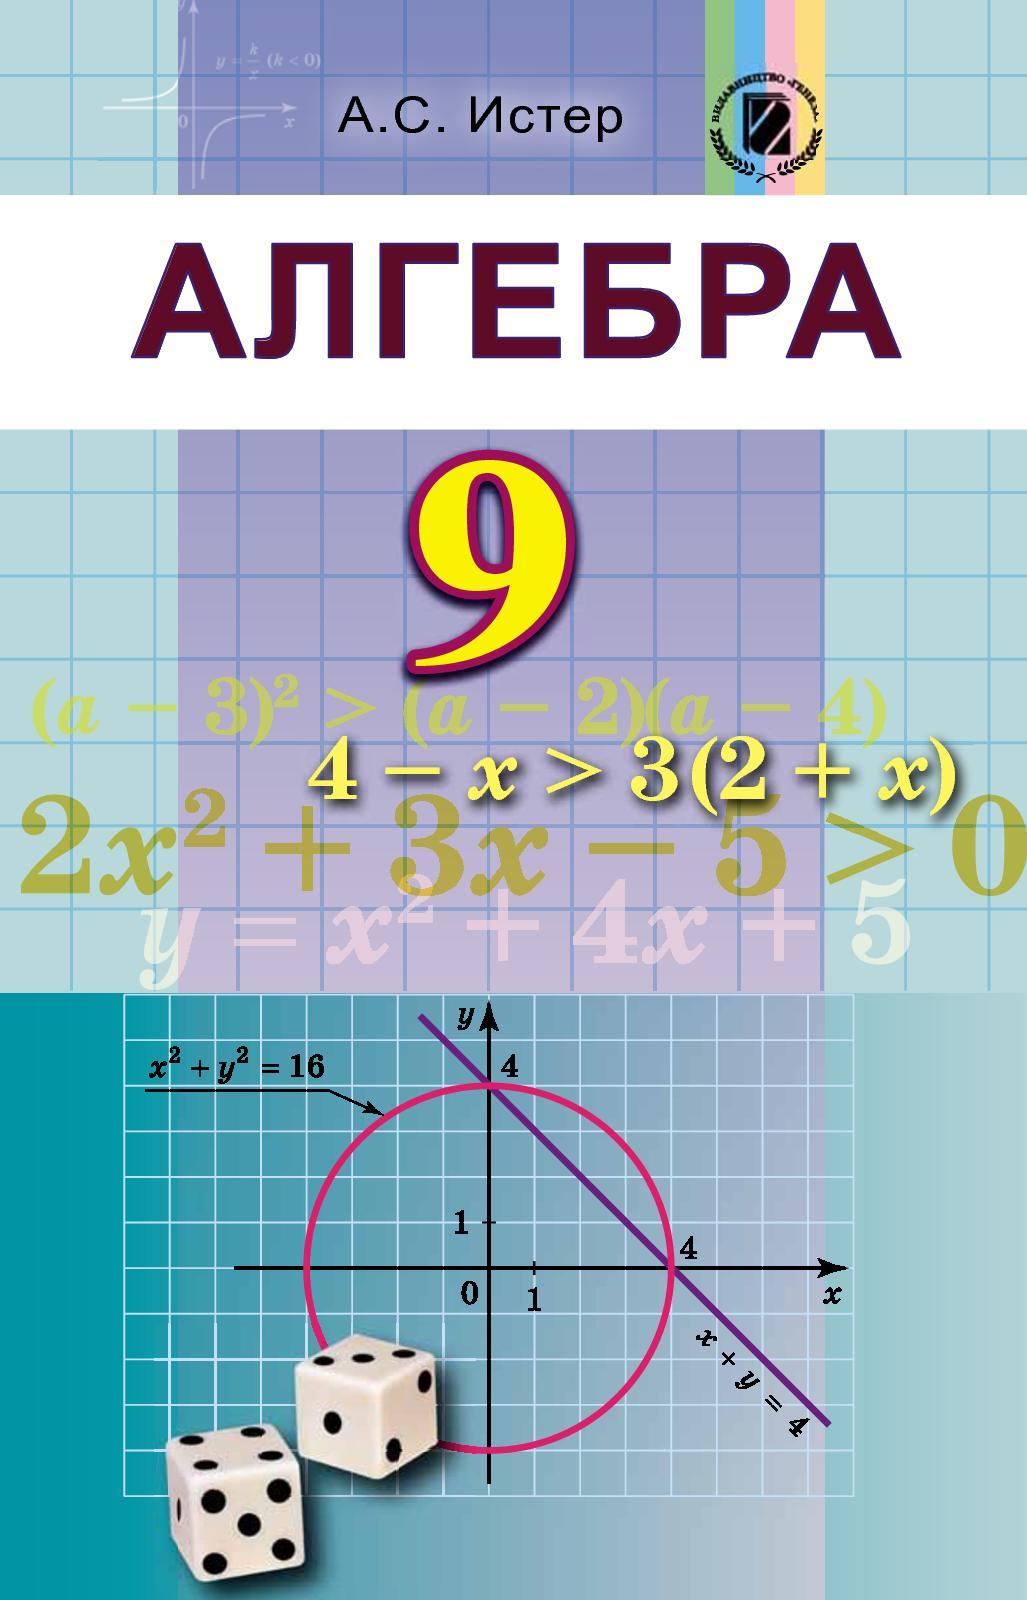 Алгебра 2019 7 клас гдз істер 2019 нова програма